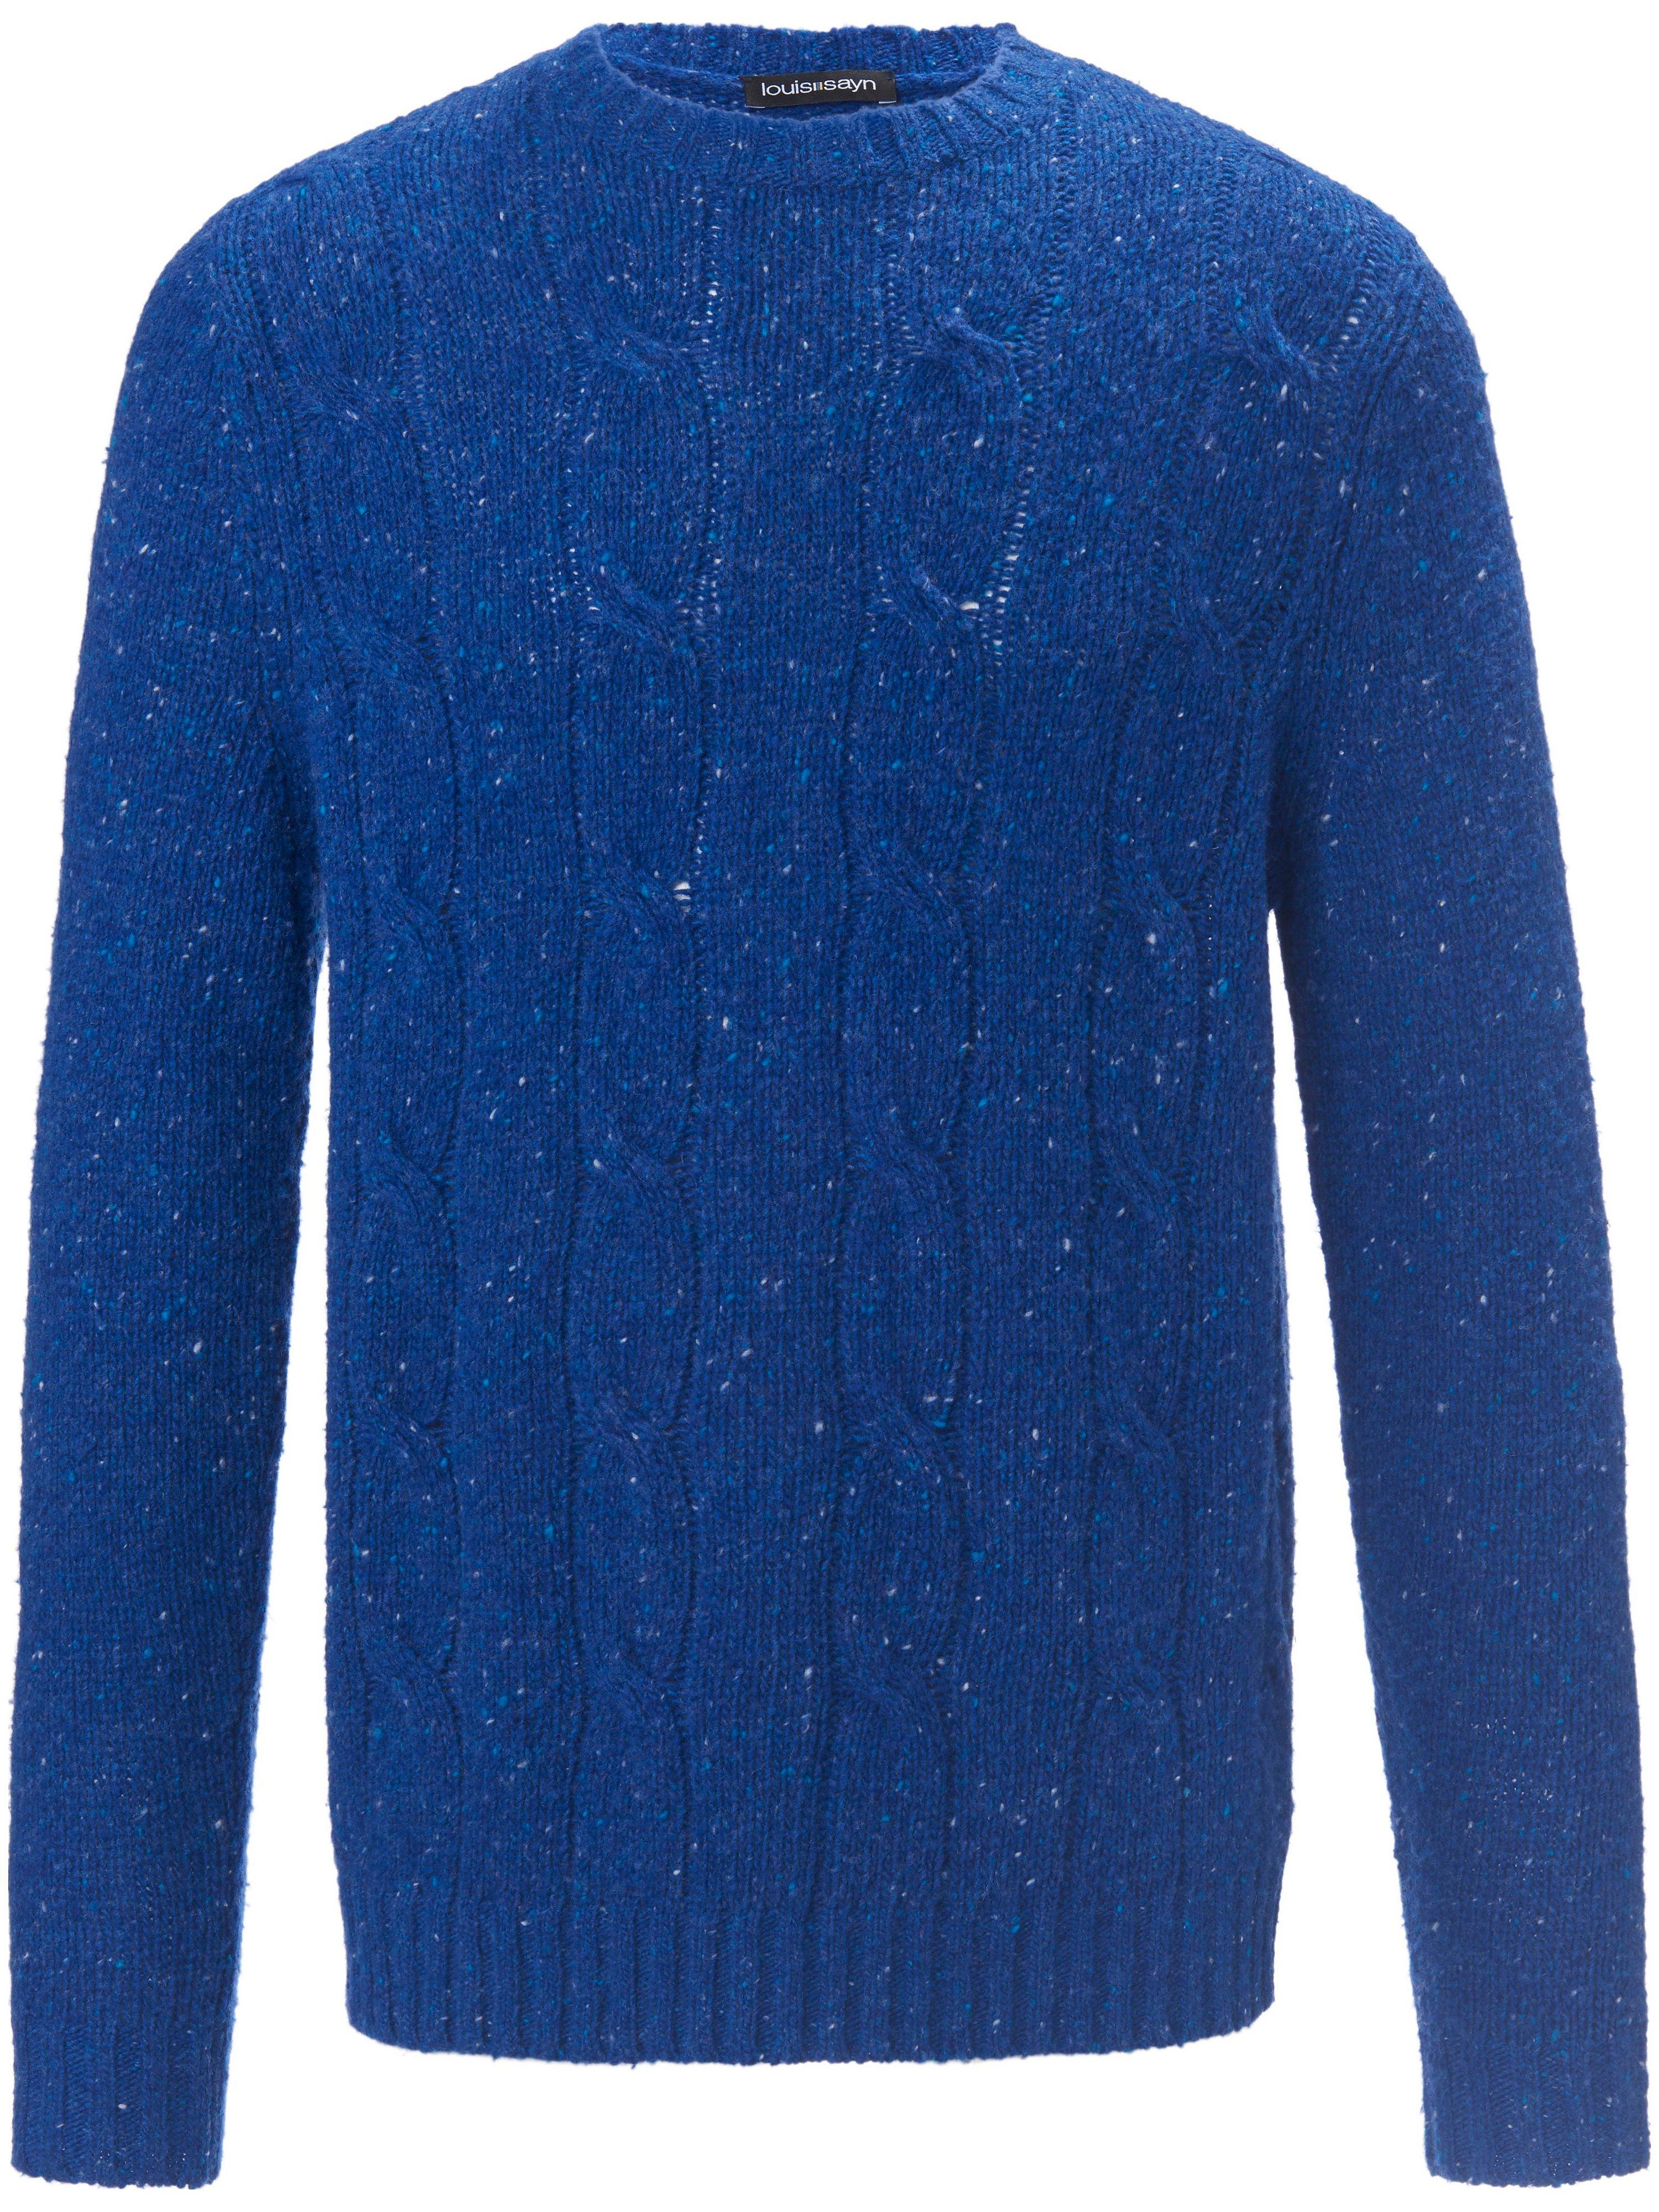 Le pull col ras-de-cou  Louis Sayn bleu taille 56